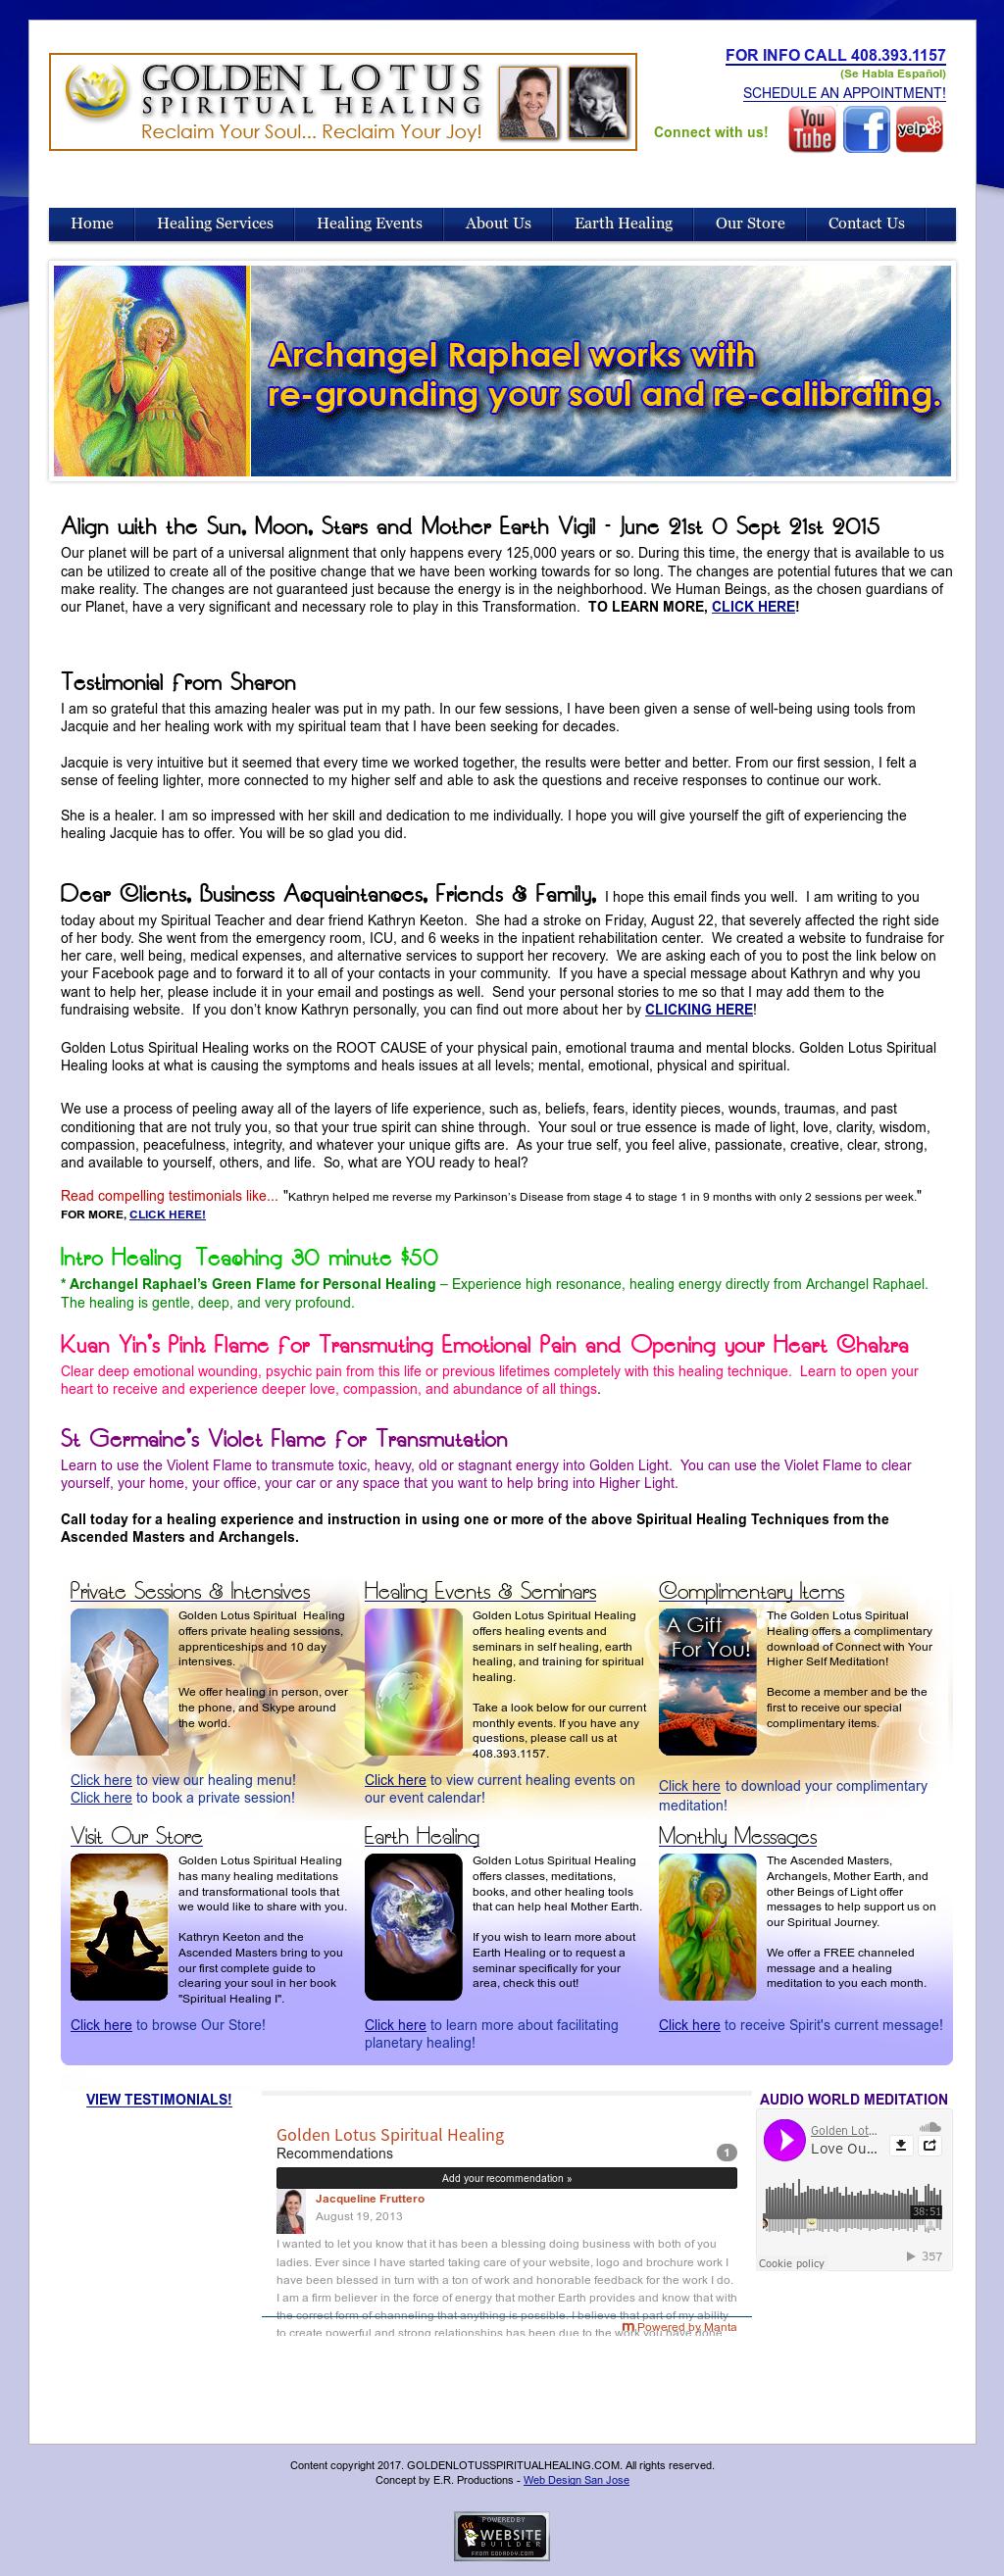 Golden Lotus Spiritual Healing Competitors, Revenue and